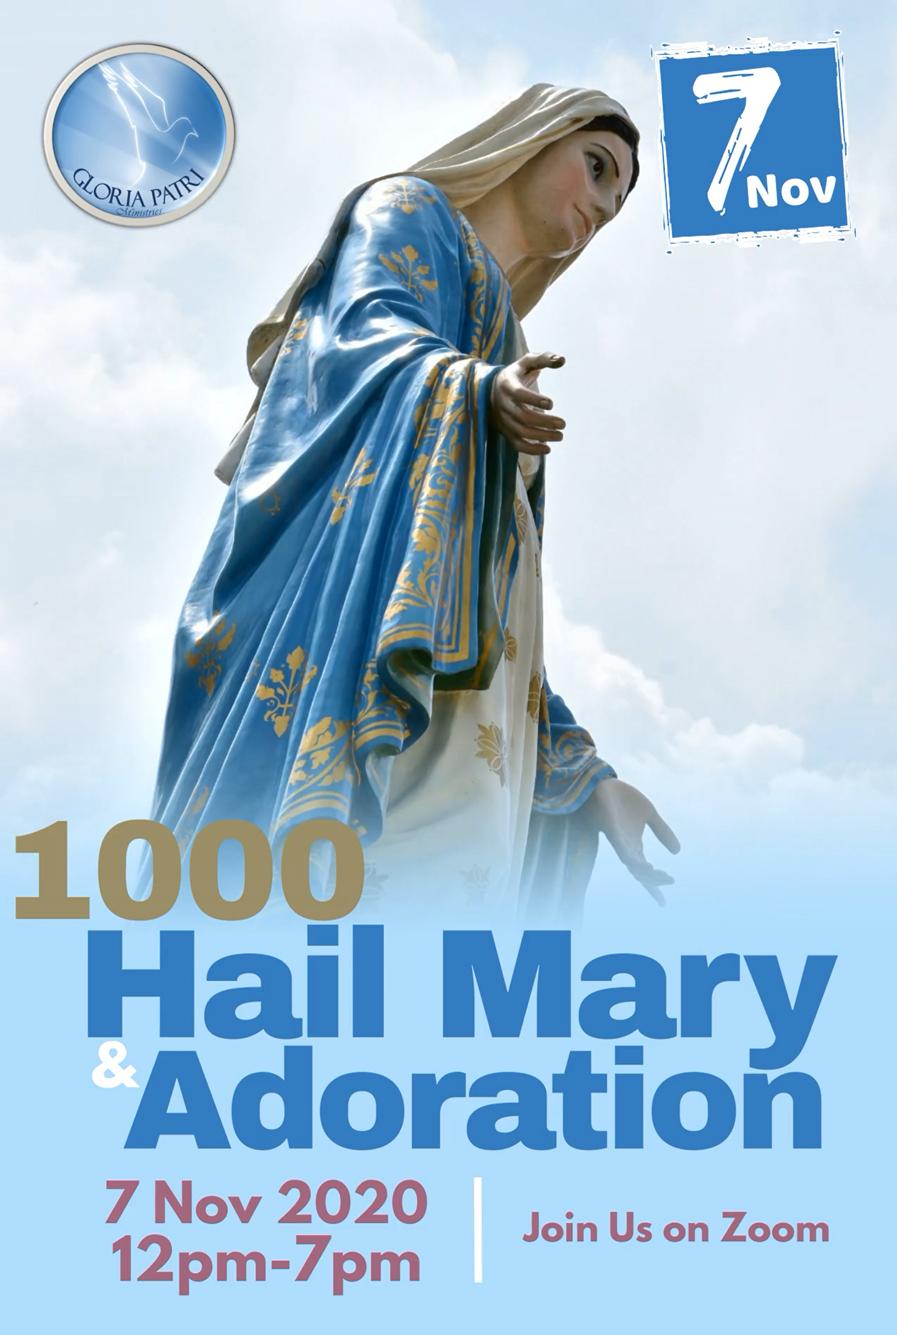 1000 Hail Marys & Adoration